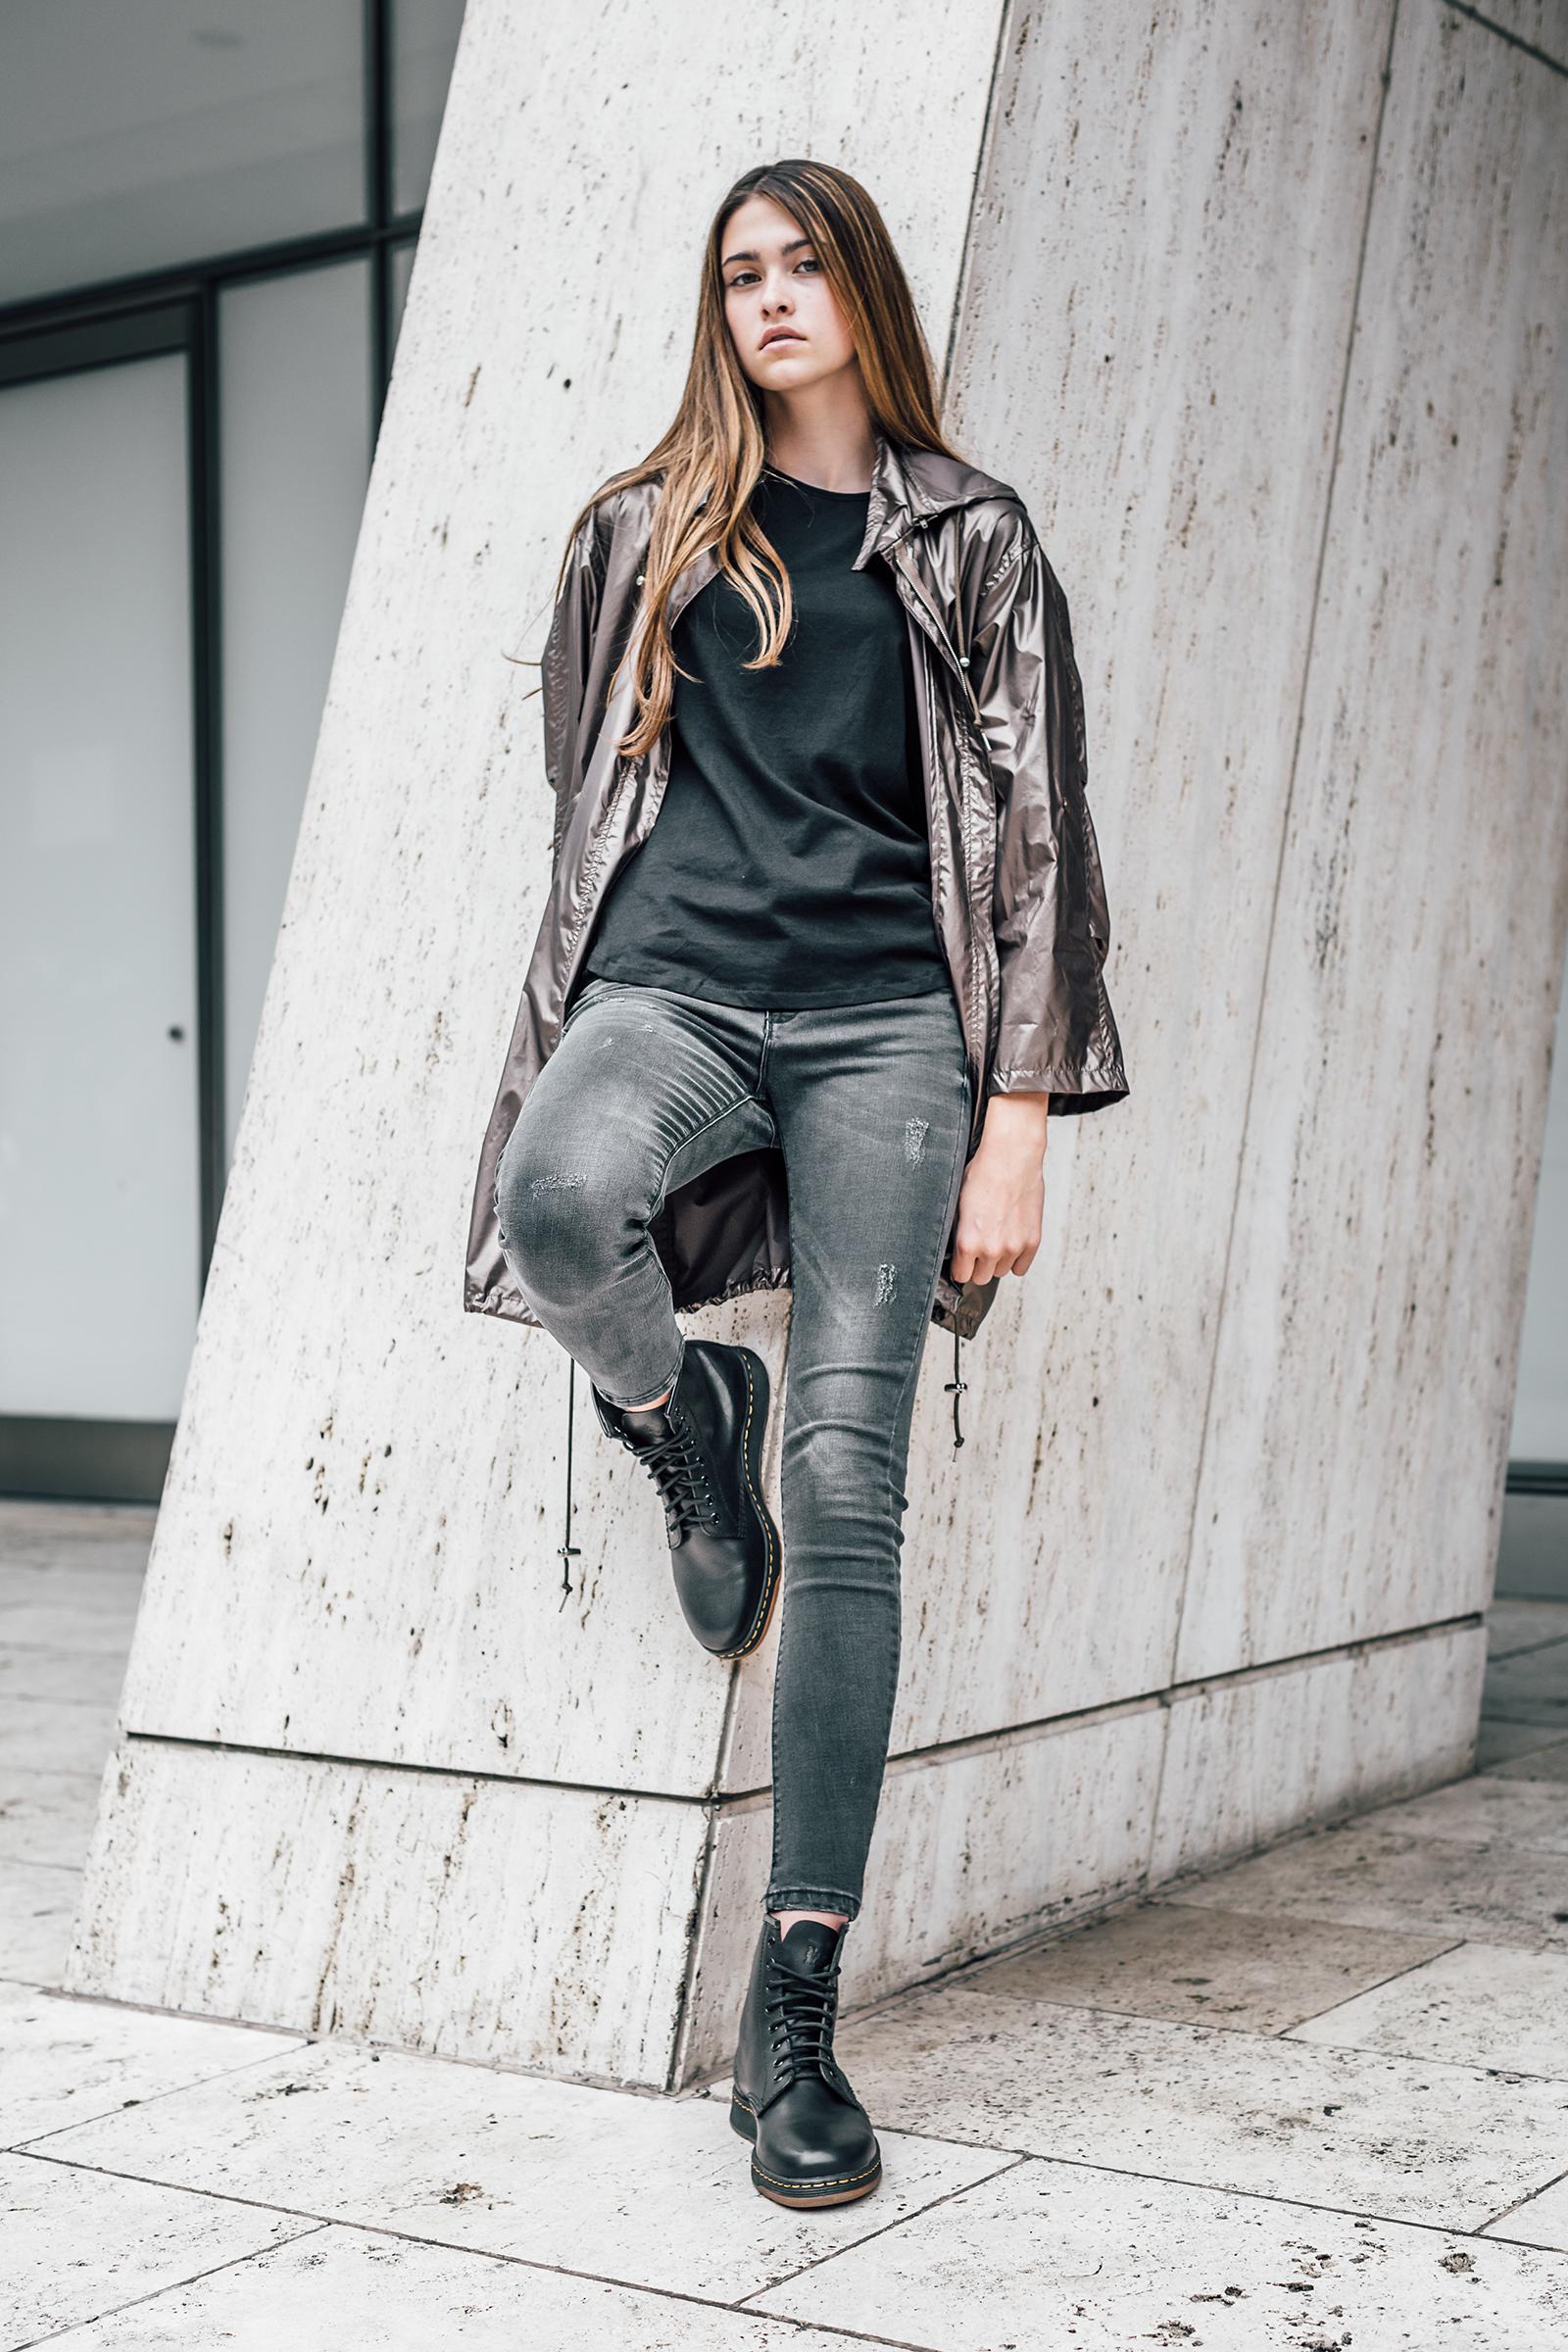 Dr Martens Girl Fashion